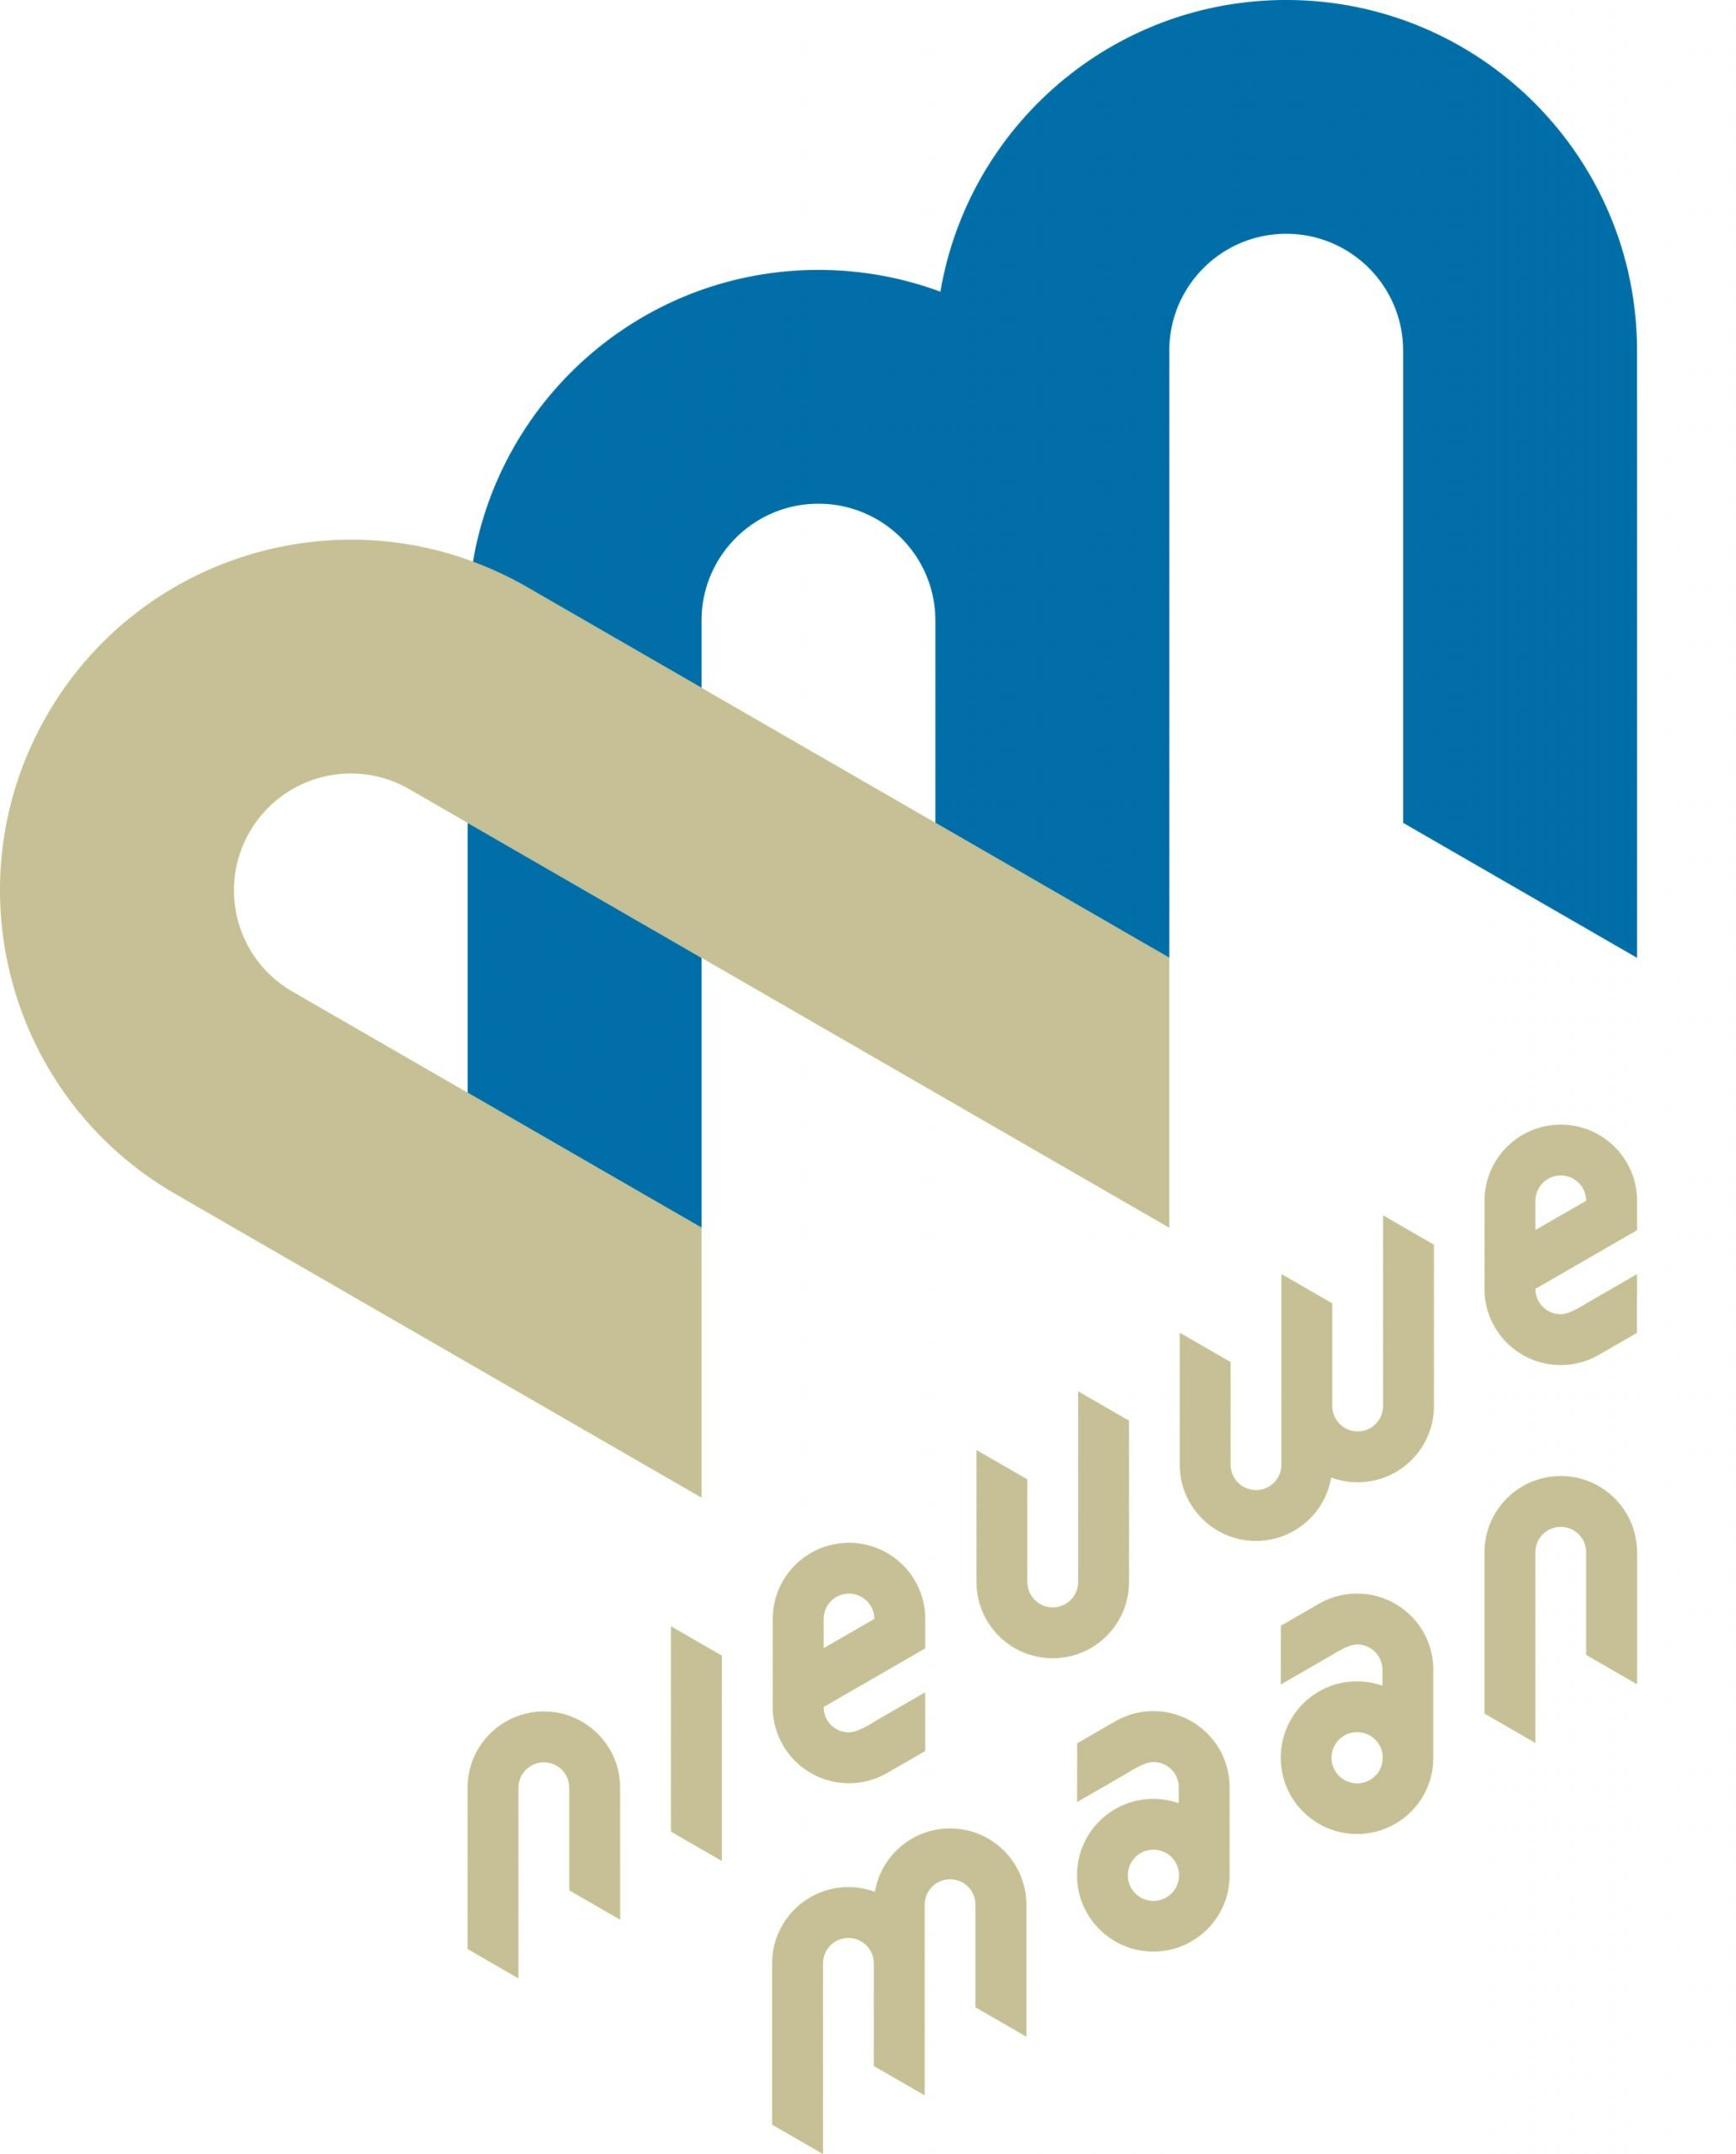 Bureau Nieuwe Maan